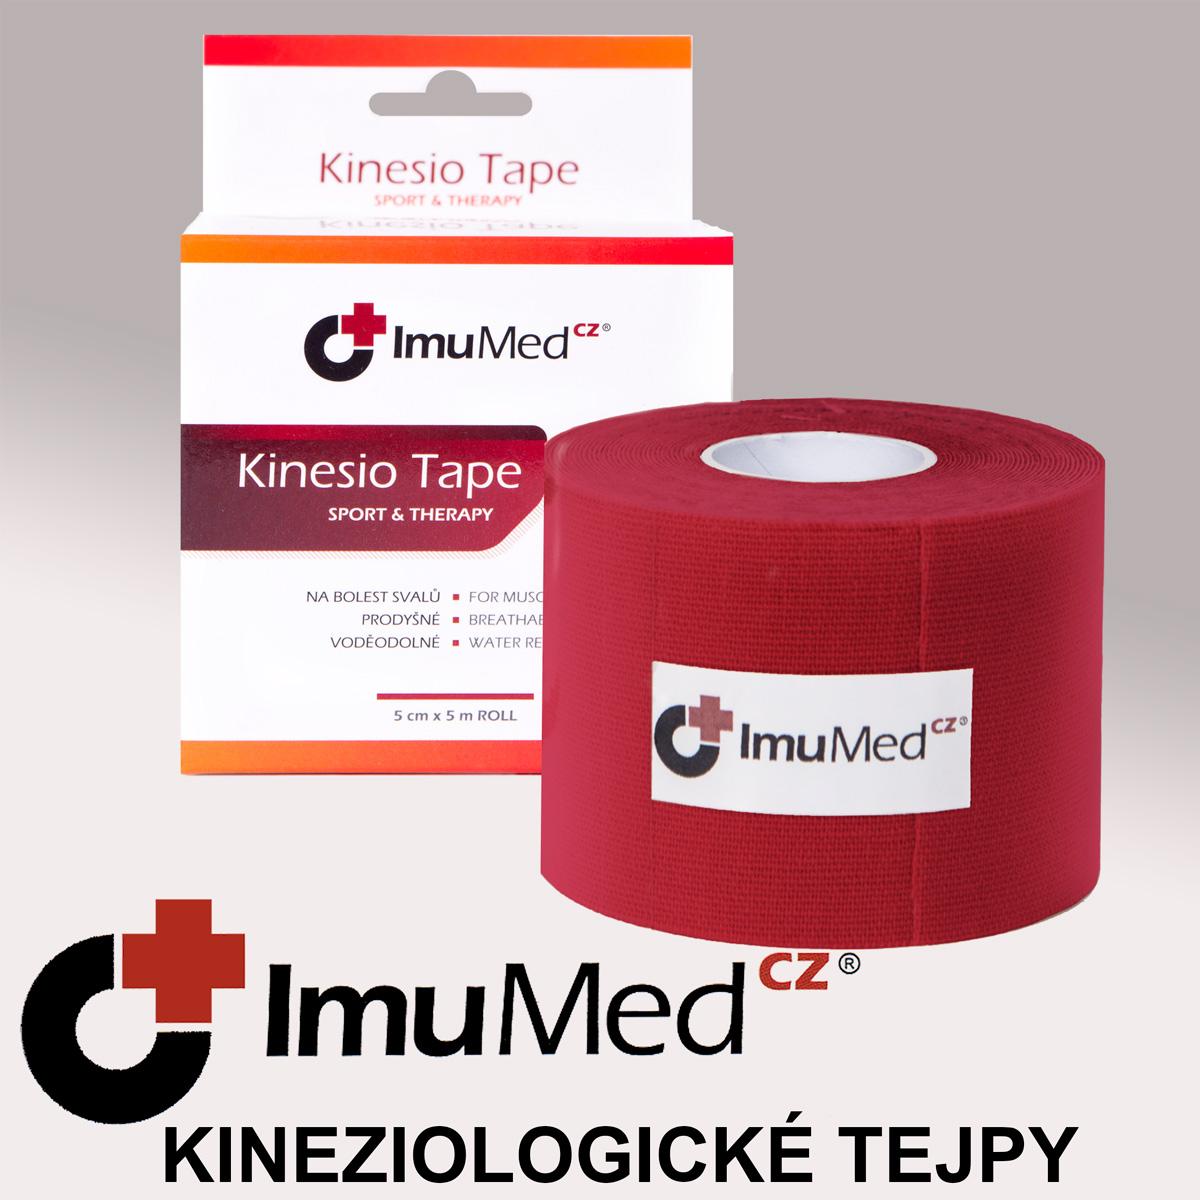 ImuMedCZ Kinesio Tape, tejpovací páska červená 5 cm x 5 m ImuMedCZ Kineziologické tejpy